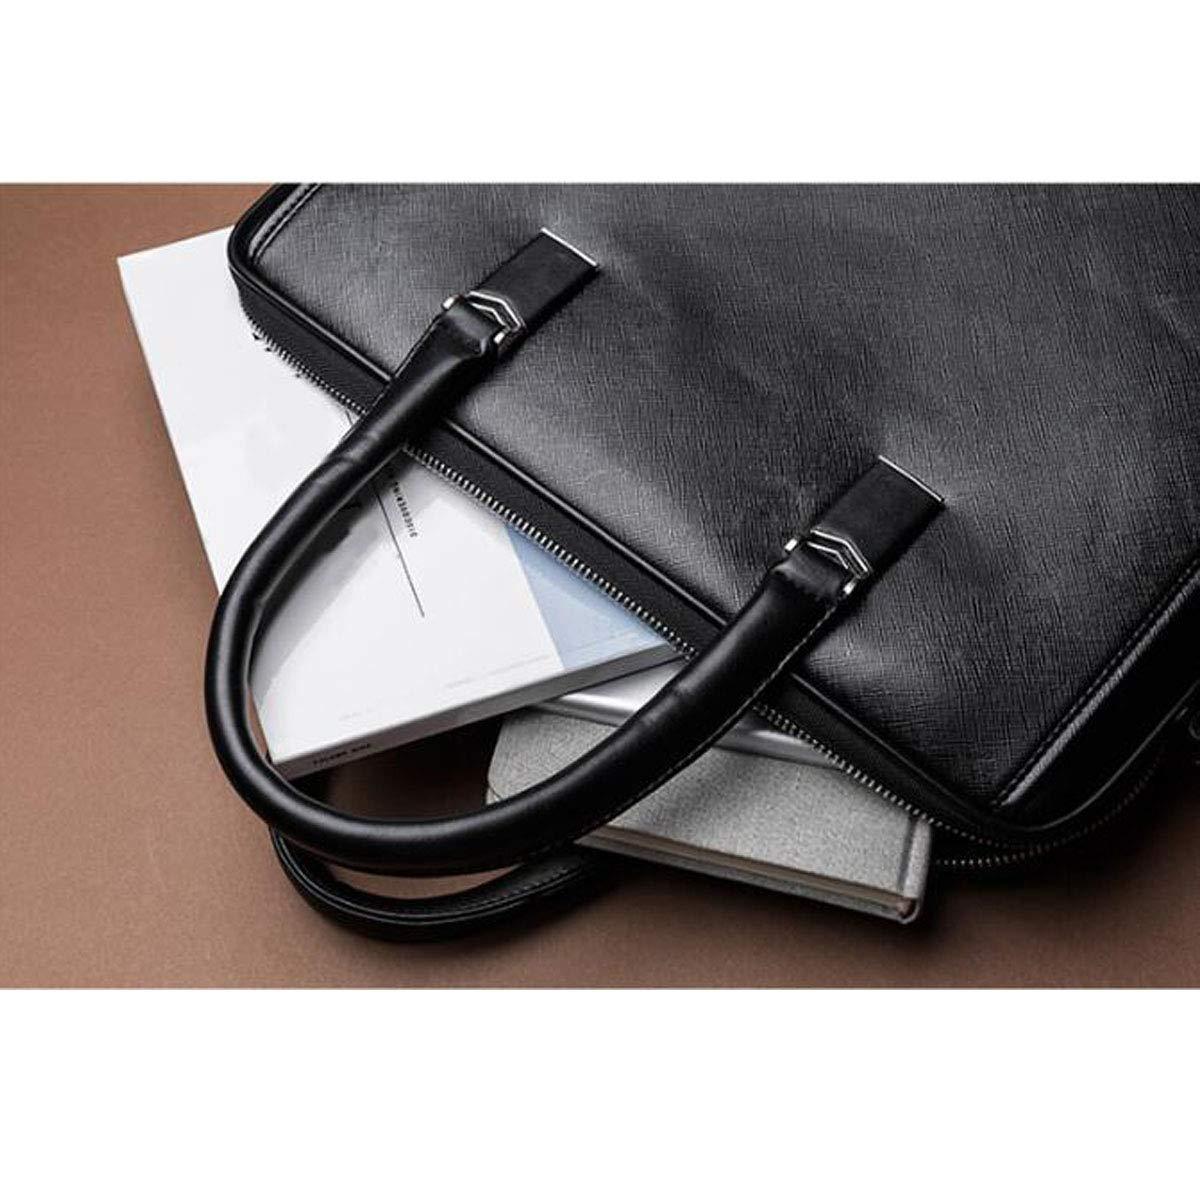 Yougou01 Briefcase Mens Business Tote Black Size: 36628cm Quality Assured Color : Black